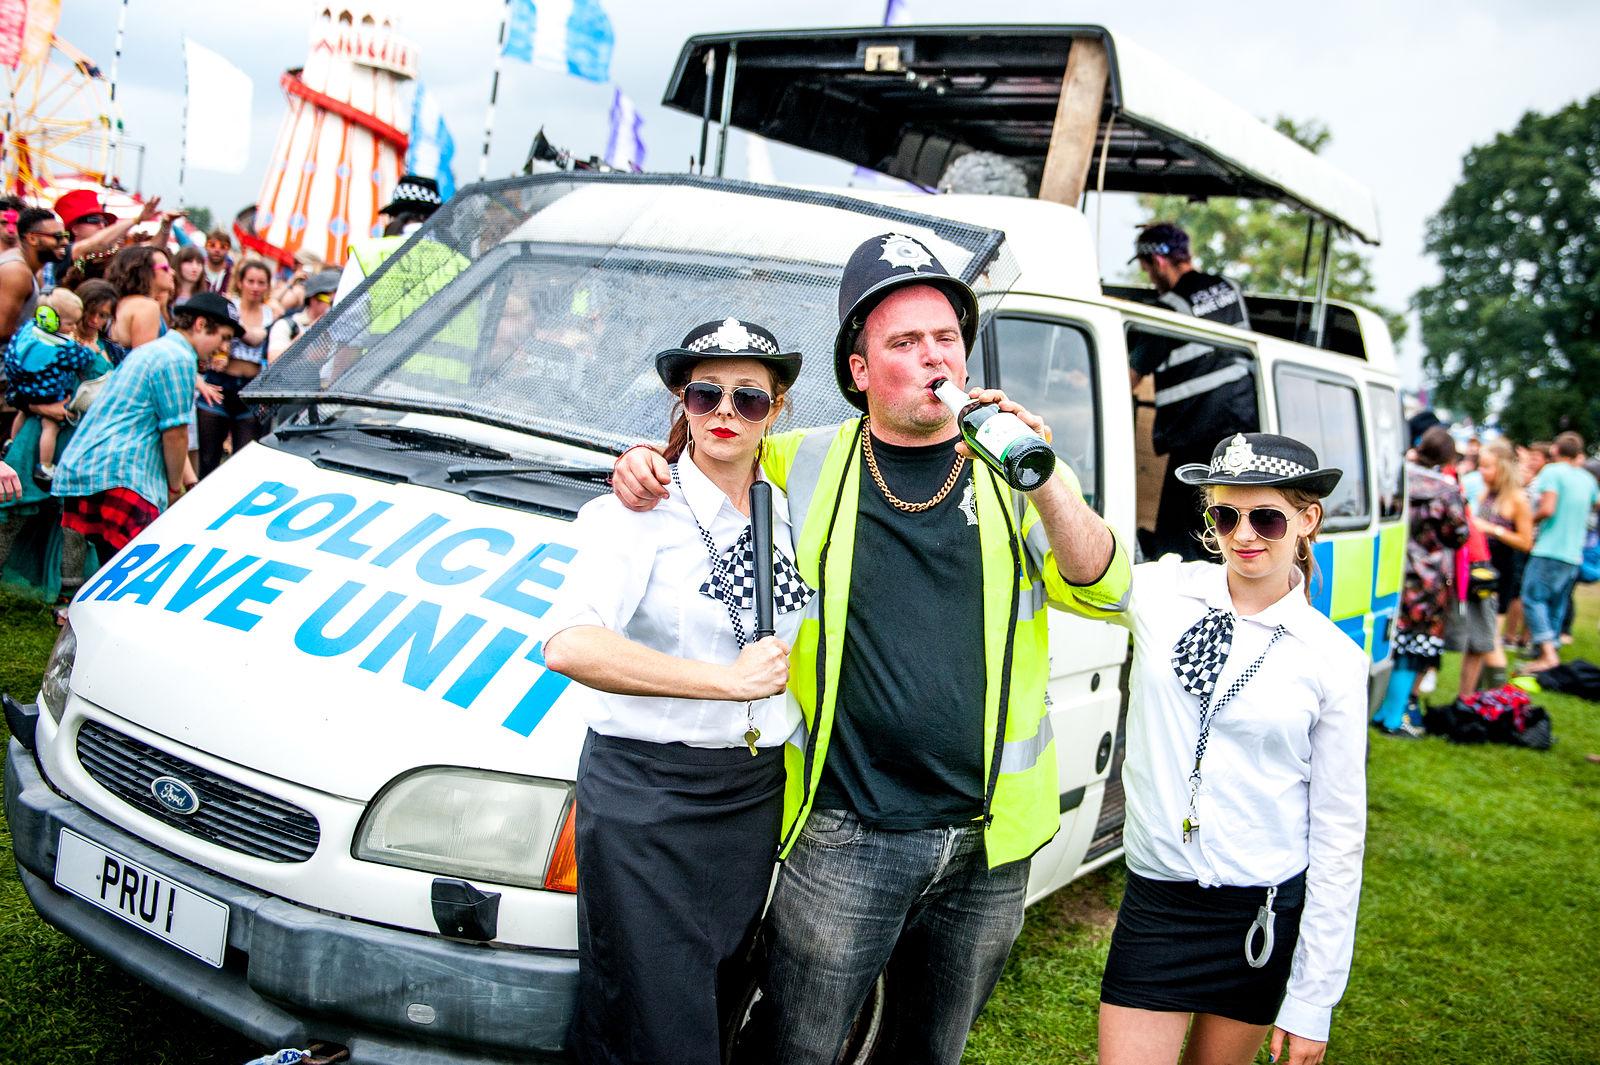 Police Rave Unit